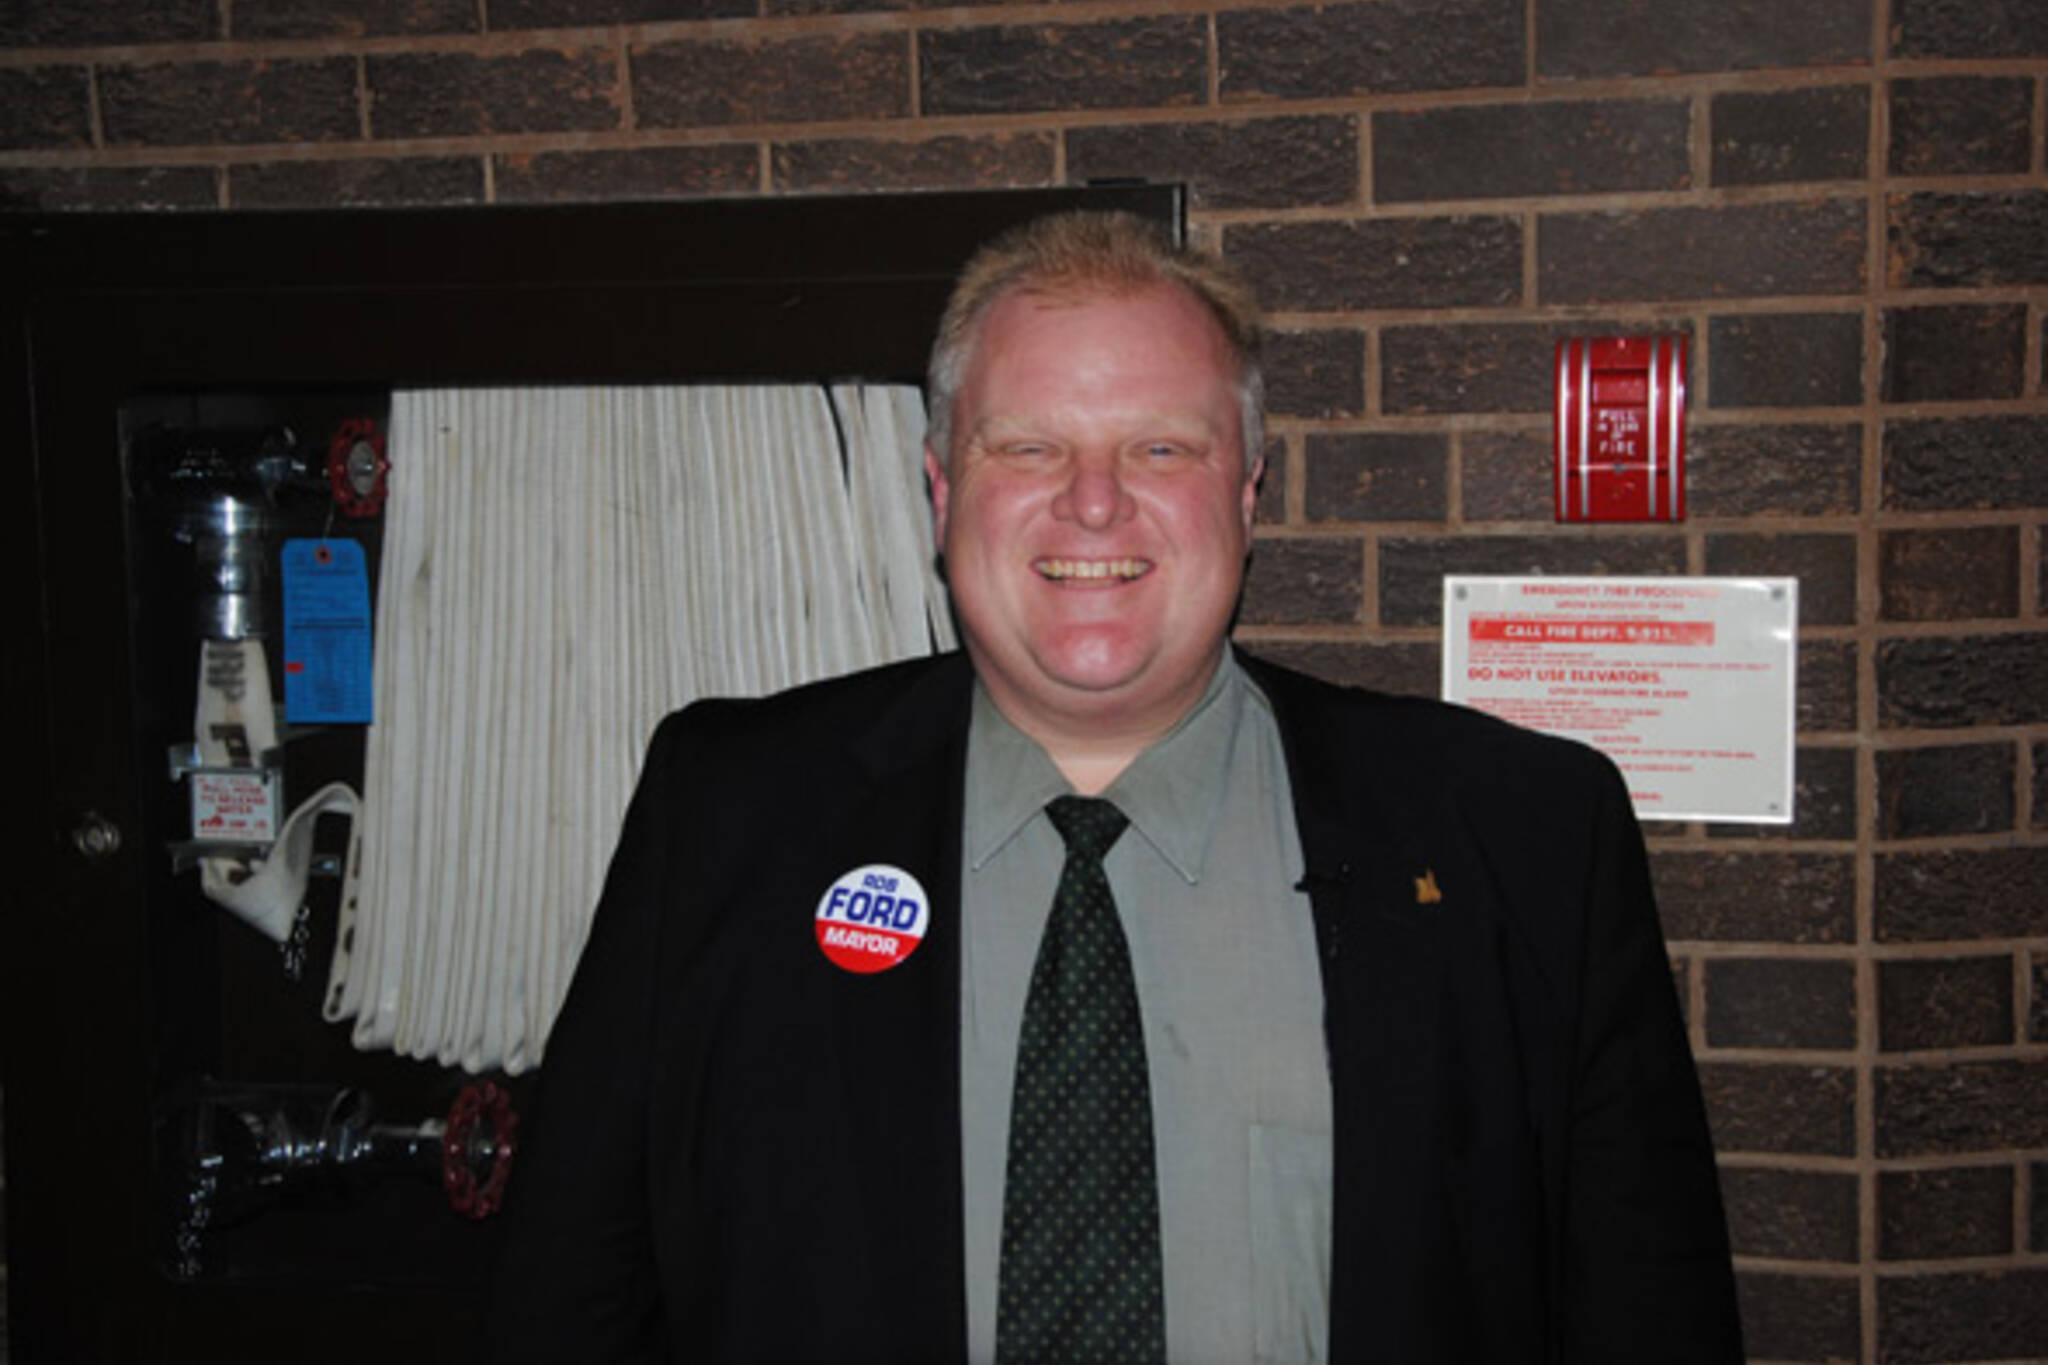 Rob Ford mayor